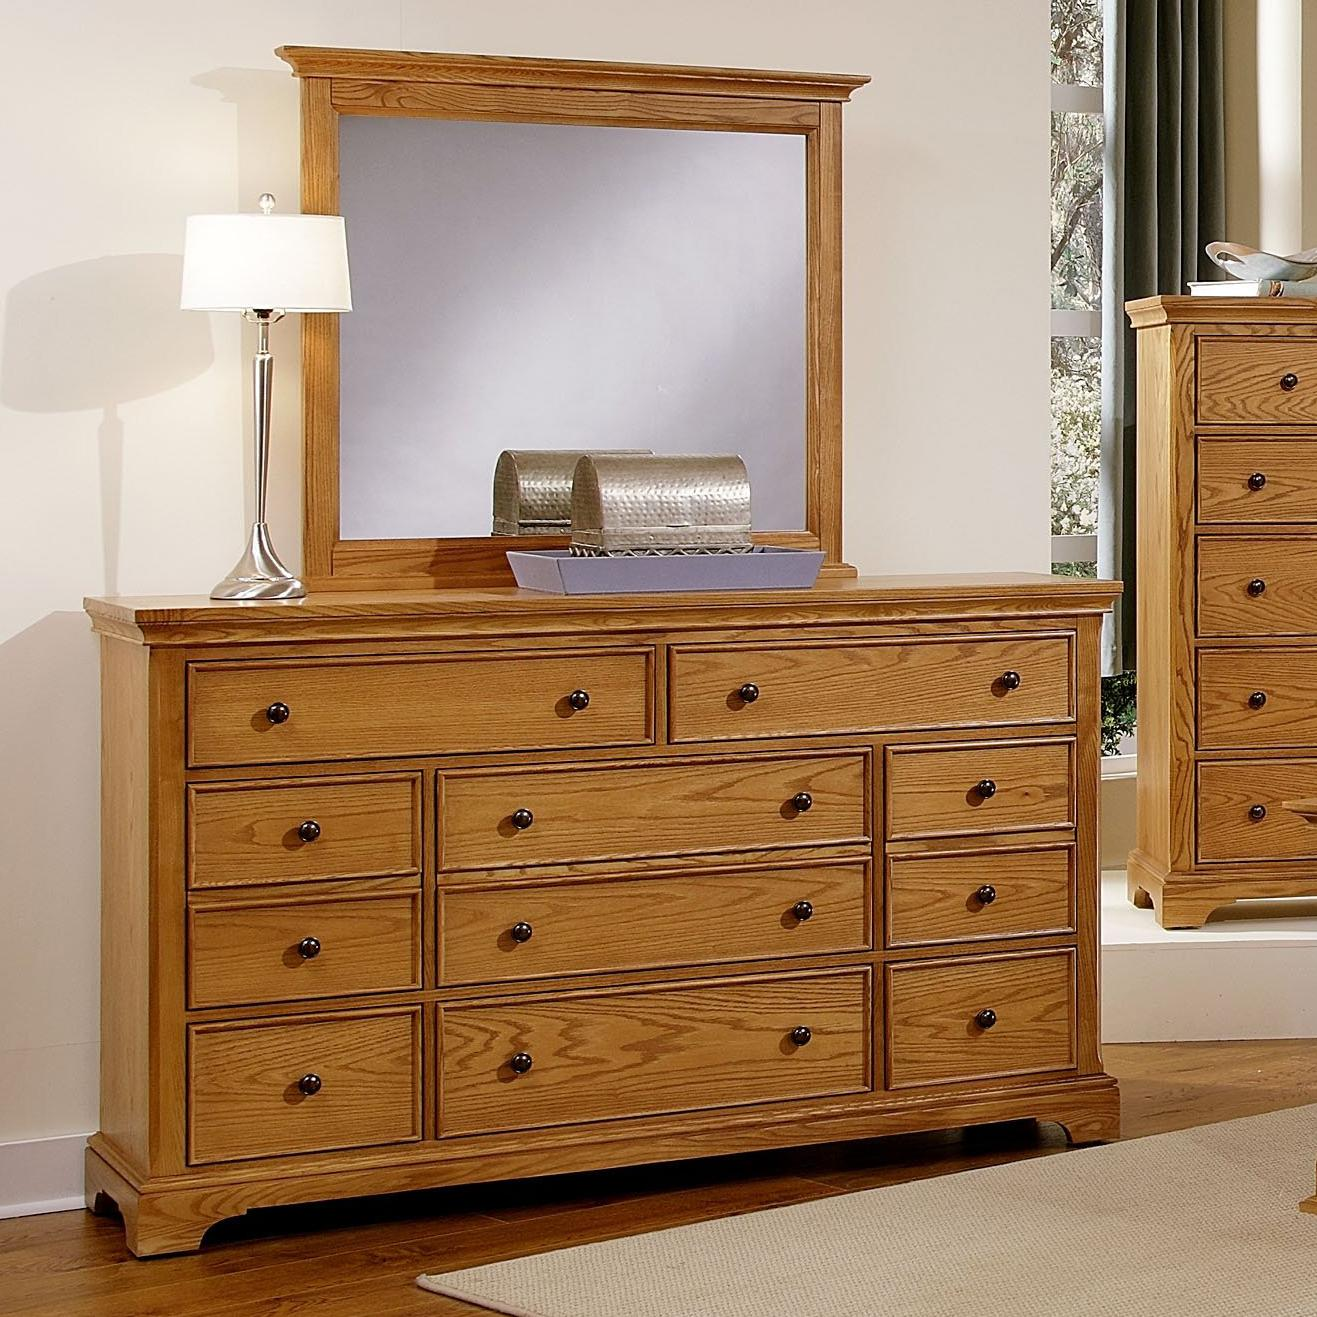 Vaughan Bassett Forsyth 8 Drawer Dresser and Mirror - Item Number: BB75-003+446